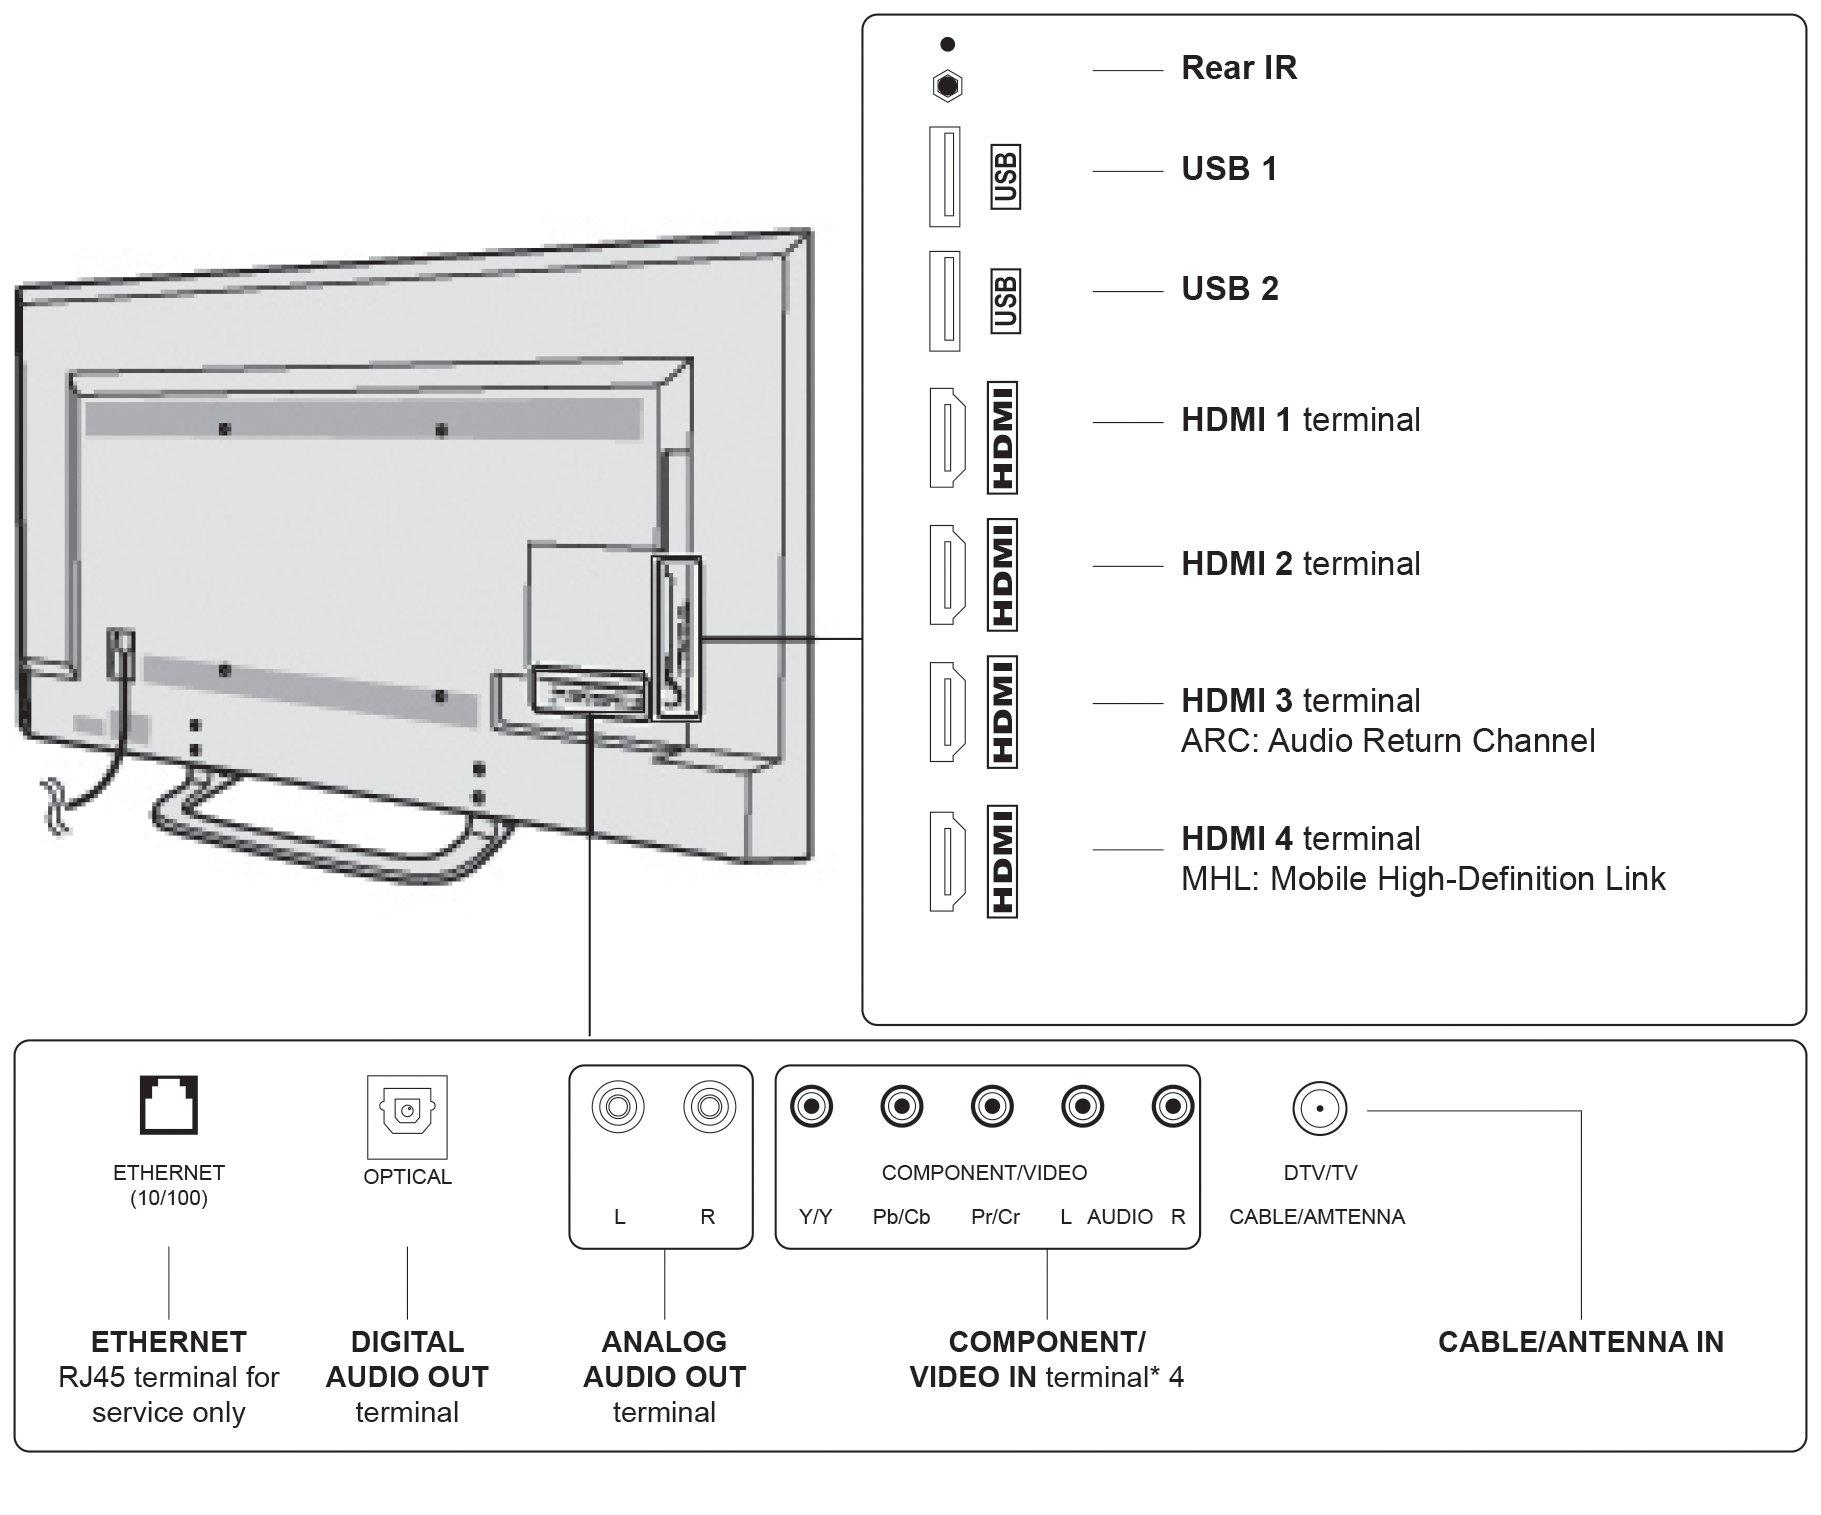 SunBriteTV Outdoor TV 43-Inch Veranda 4K Ultra HD LED Weatherproof Television - SB-4374UHD-BL Black by SunbriteTV